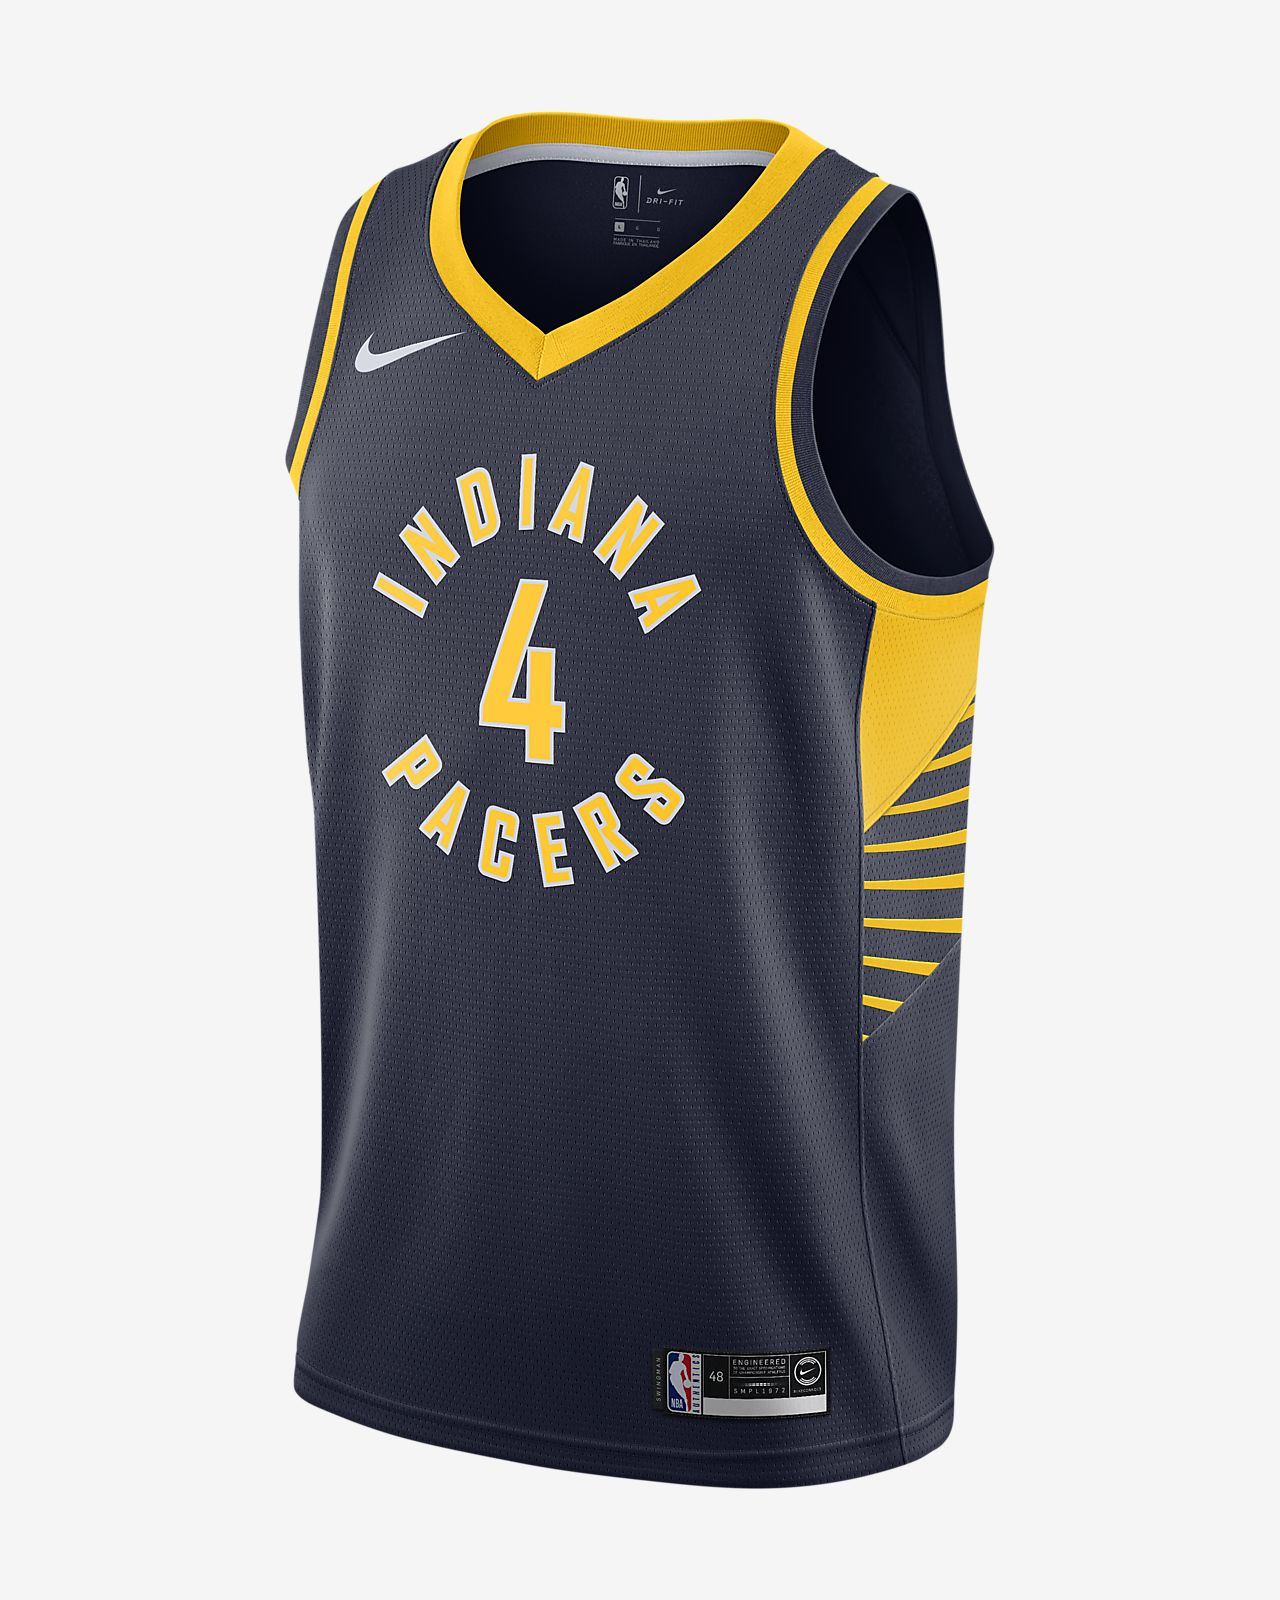 Camiseta Nike NBA Swingman Victor Oladipo Pacers Icon Edition